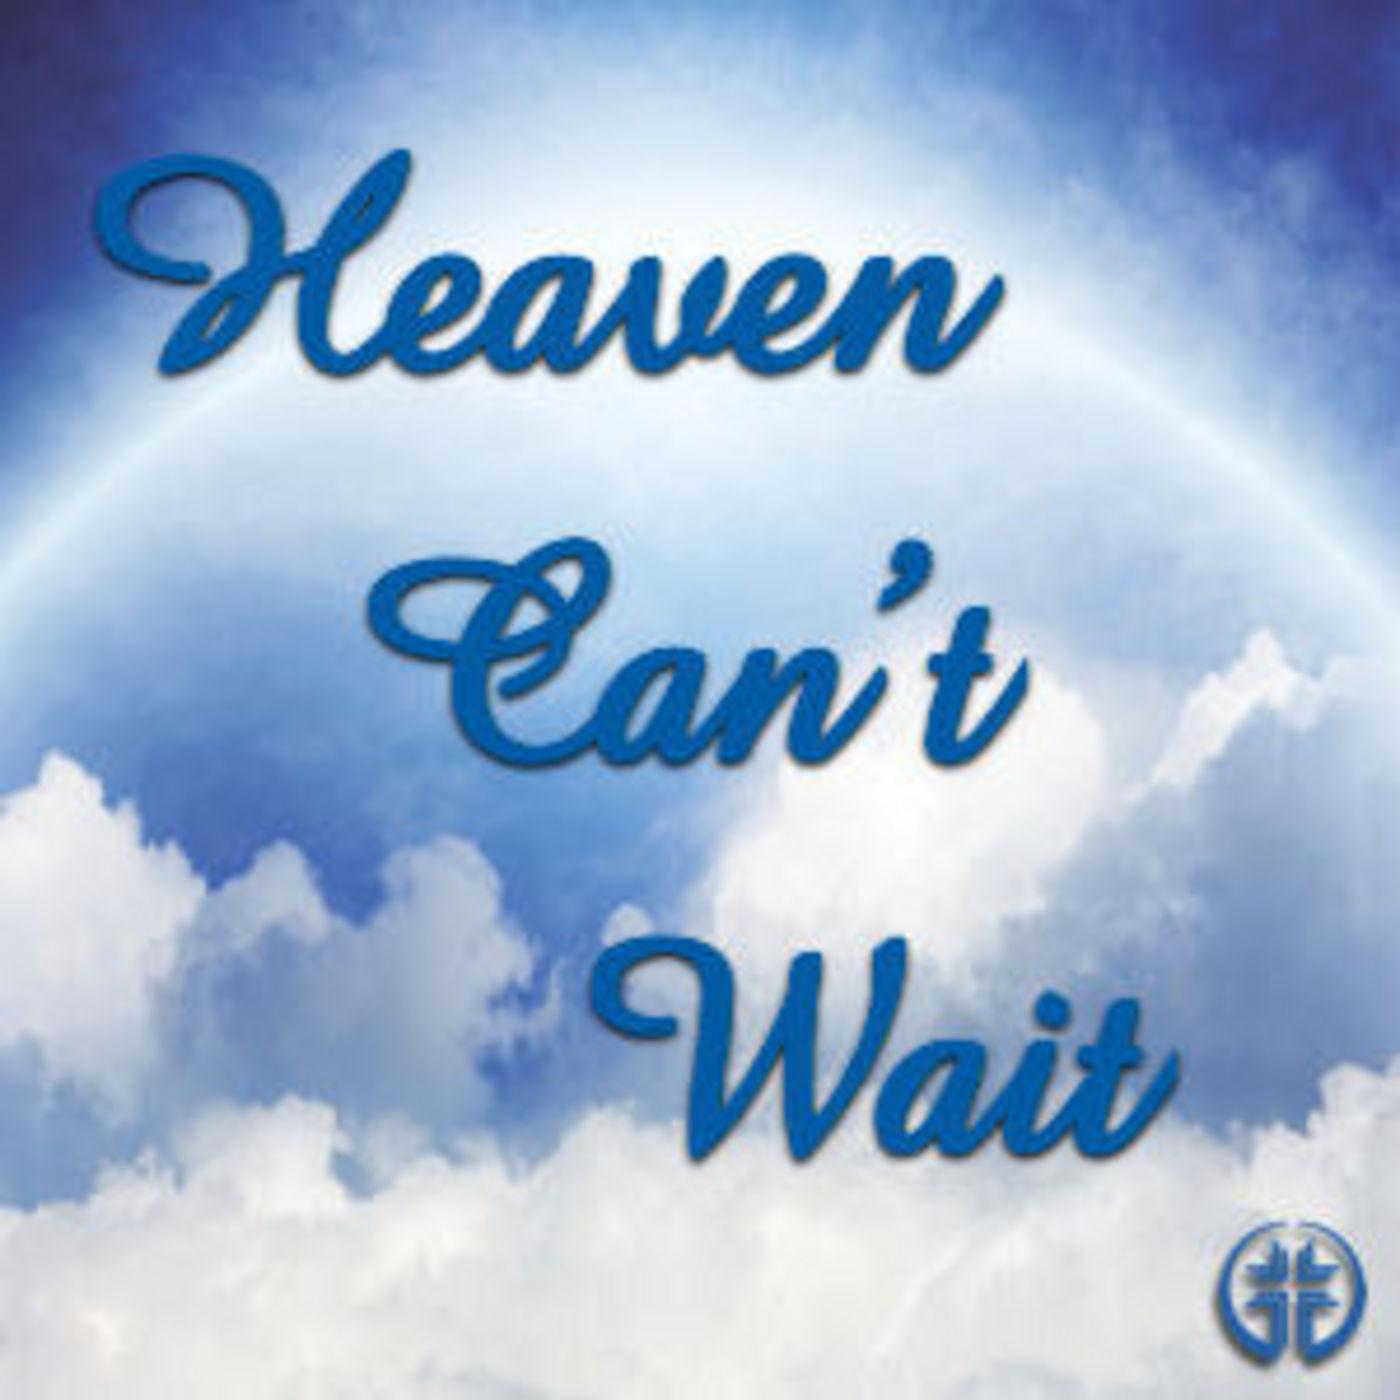 <![CDATA[Heaven]]>